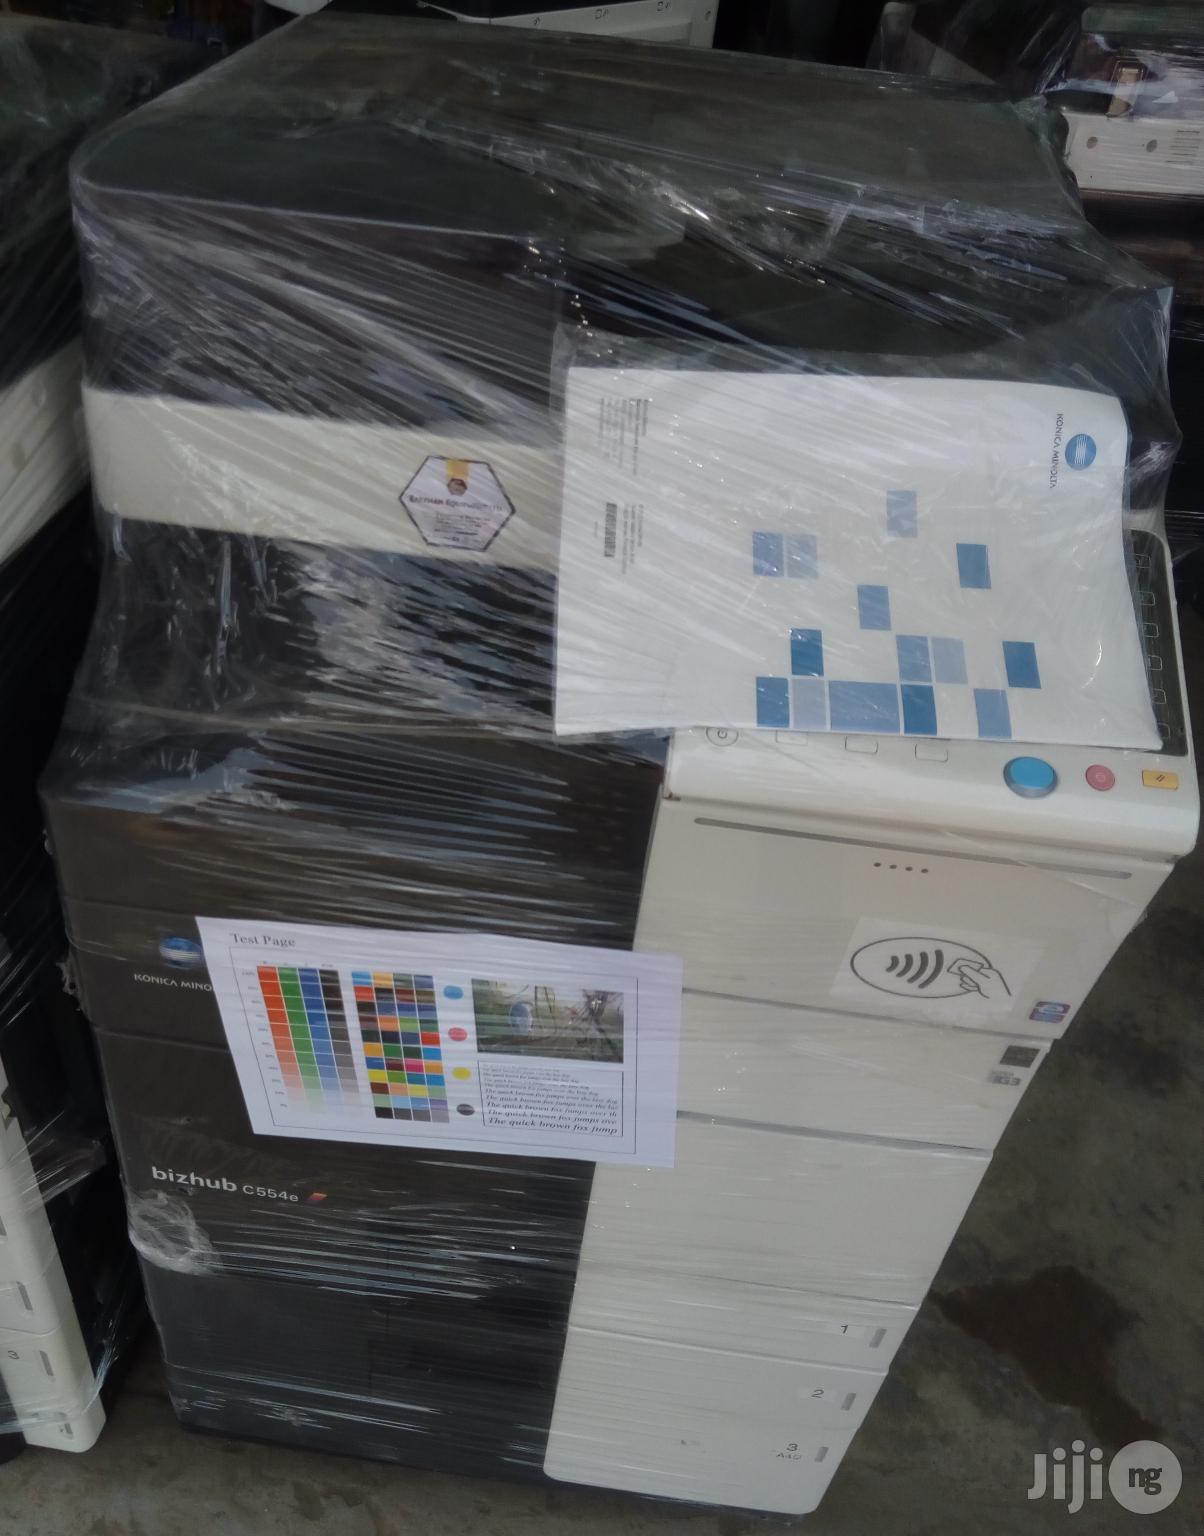 Konica Minolta Bizhub554e Direct Image Printer/Photocopier | Printers & Scanners for sale in Surulere, Lagos State, Nigeria